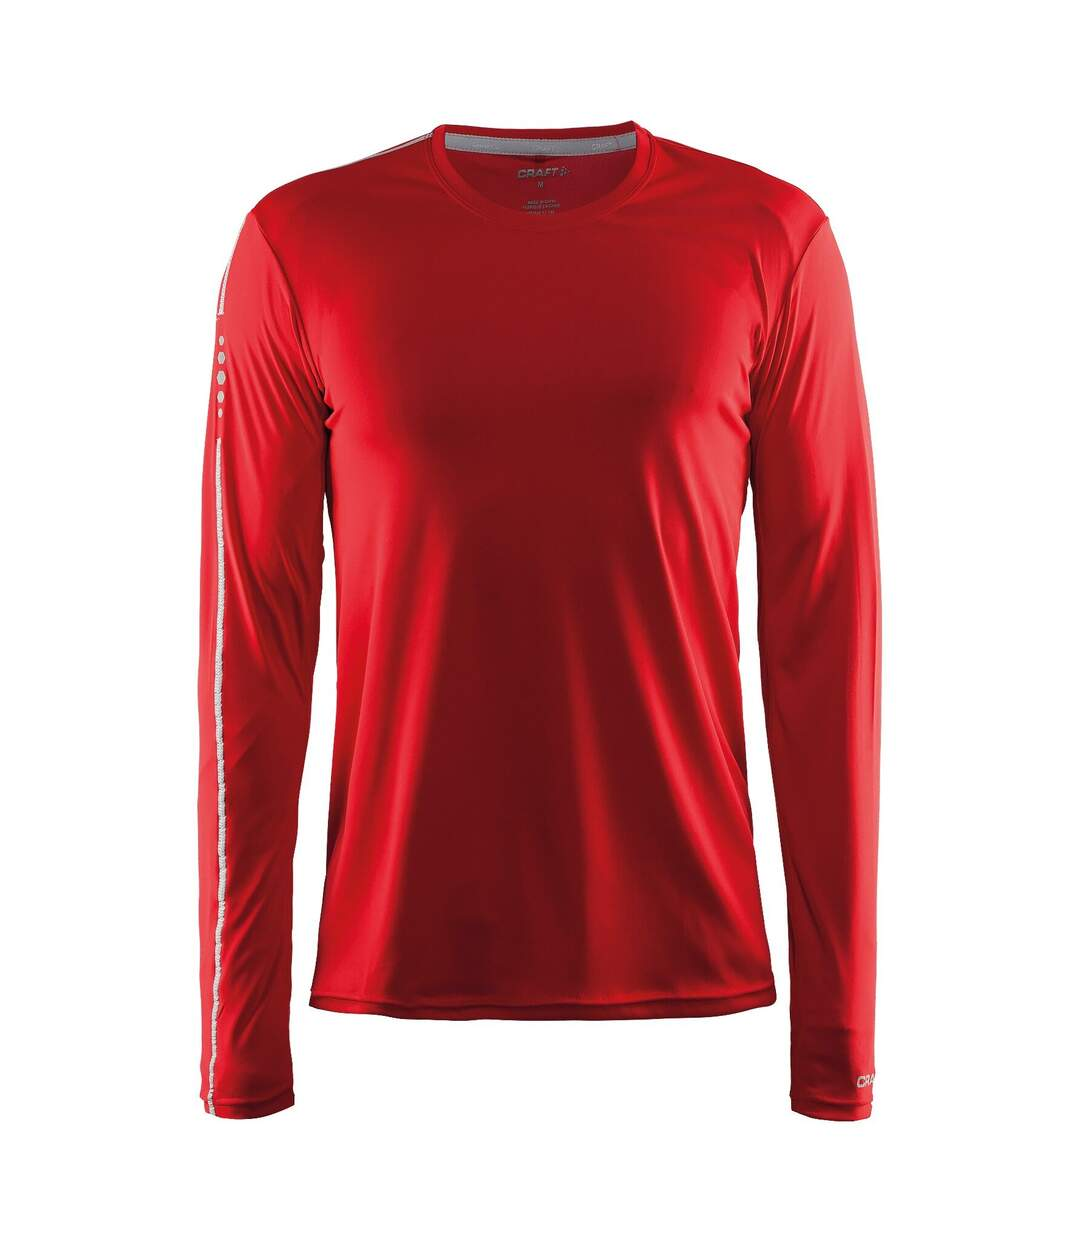 Craft Mens Mind Long Sleeve T-Shirt (Red) - UTRW6154